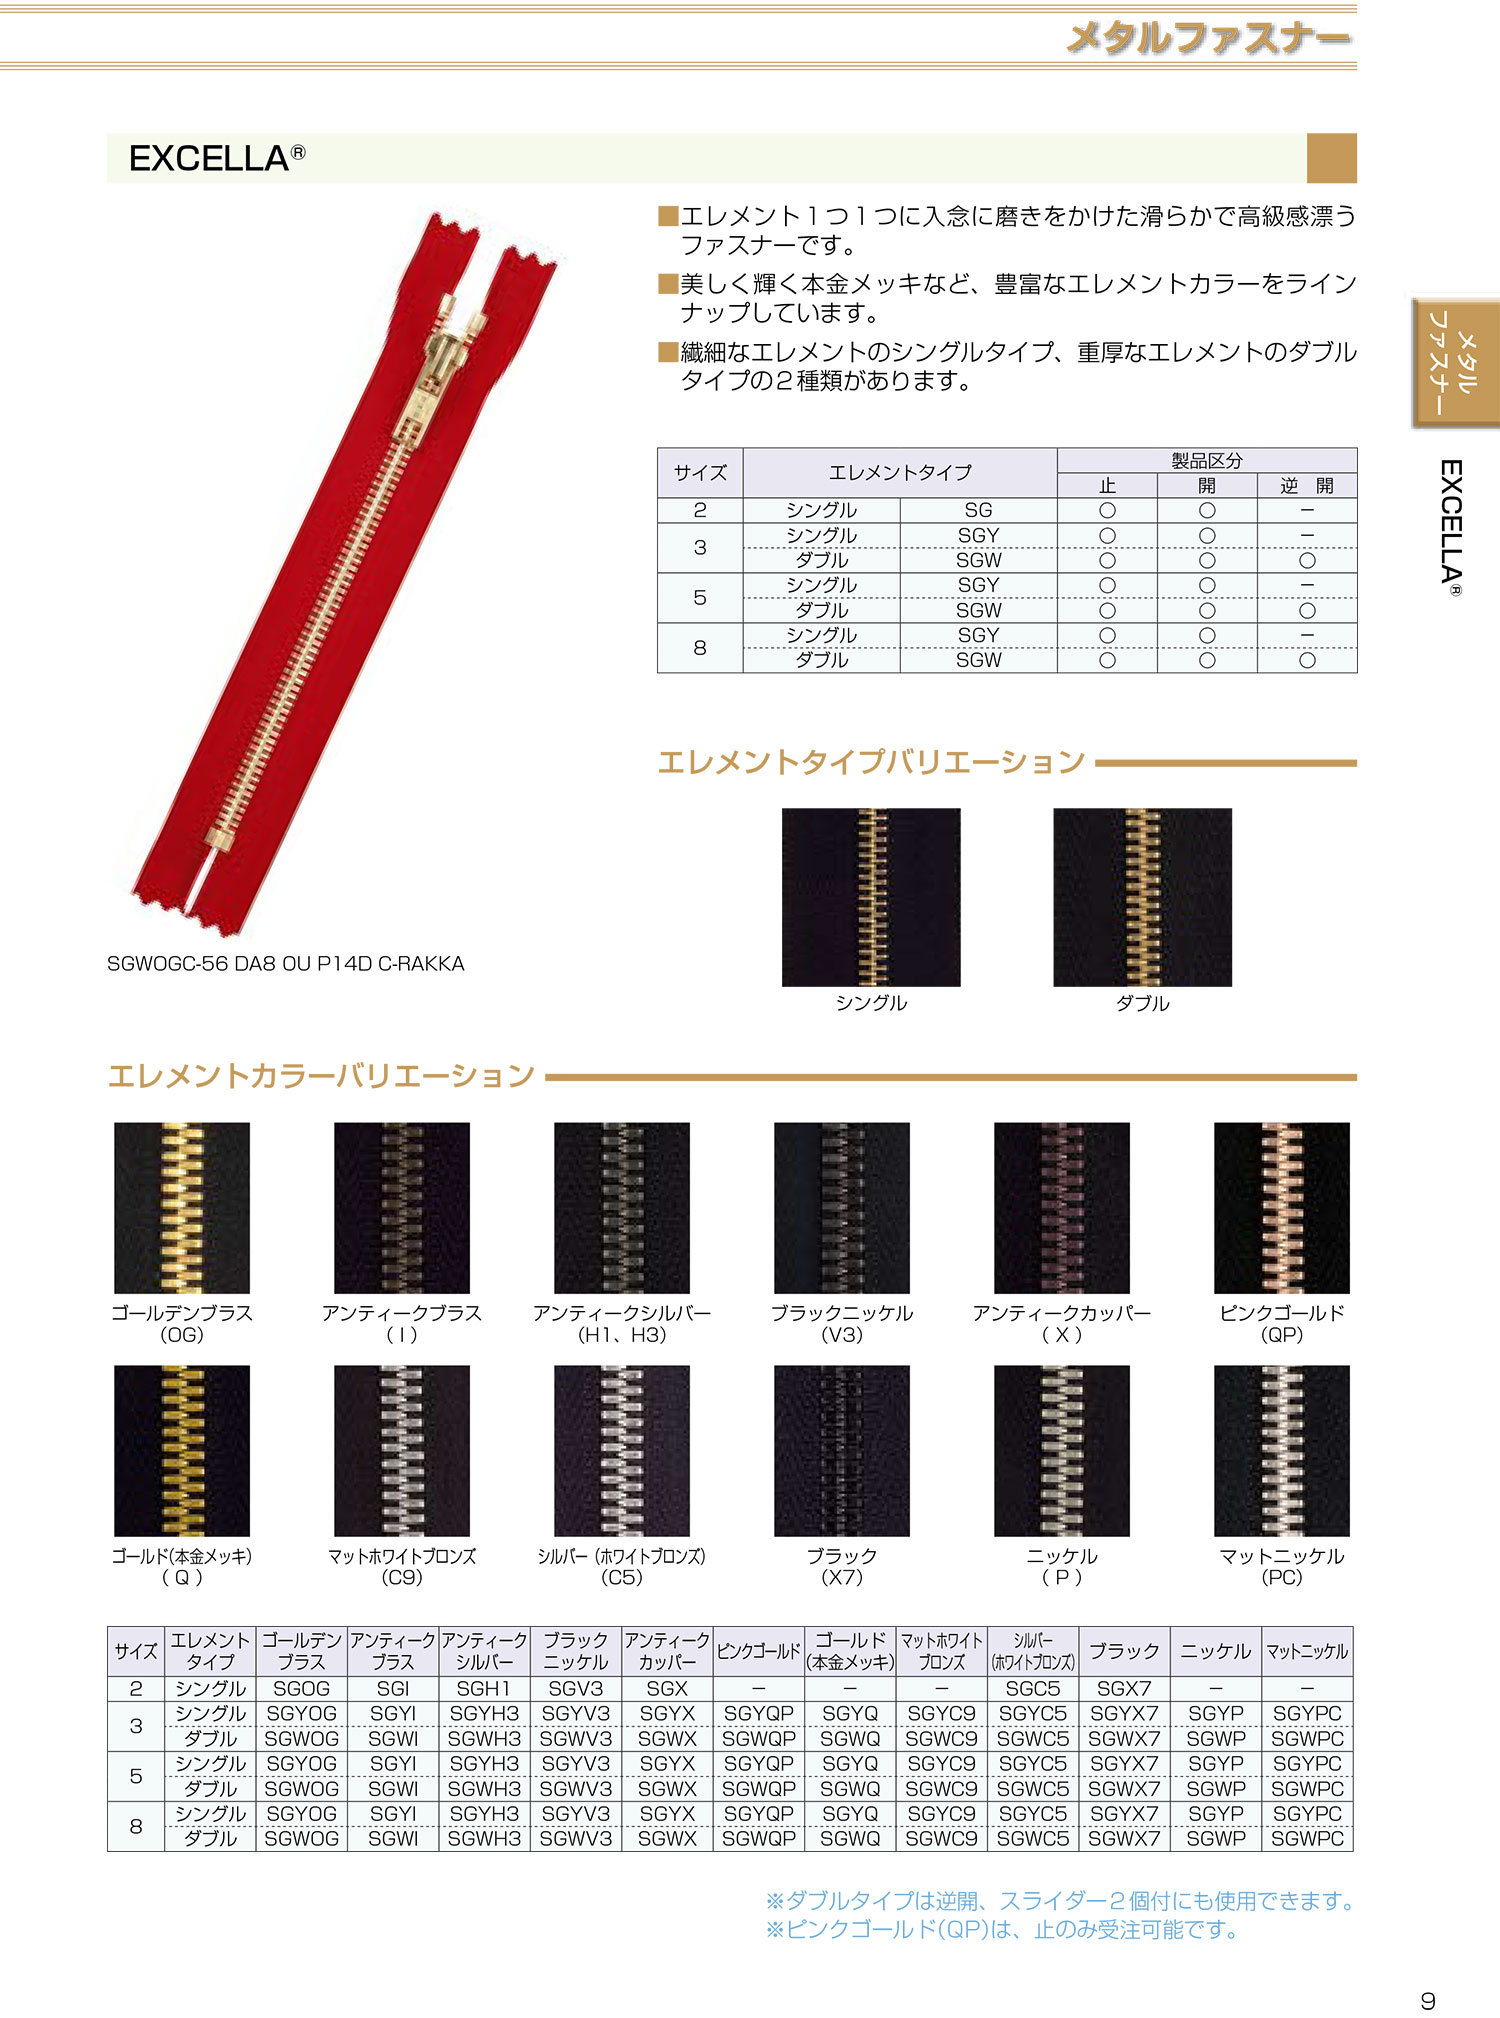 5SGWC9MR エクセラ 5サイズ マットホワイトブロンズ 逆開 ダブル[ファスナー] YKK/オークラ商事 - ApparelX アパレル資材卸通販